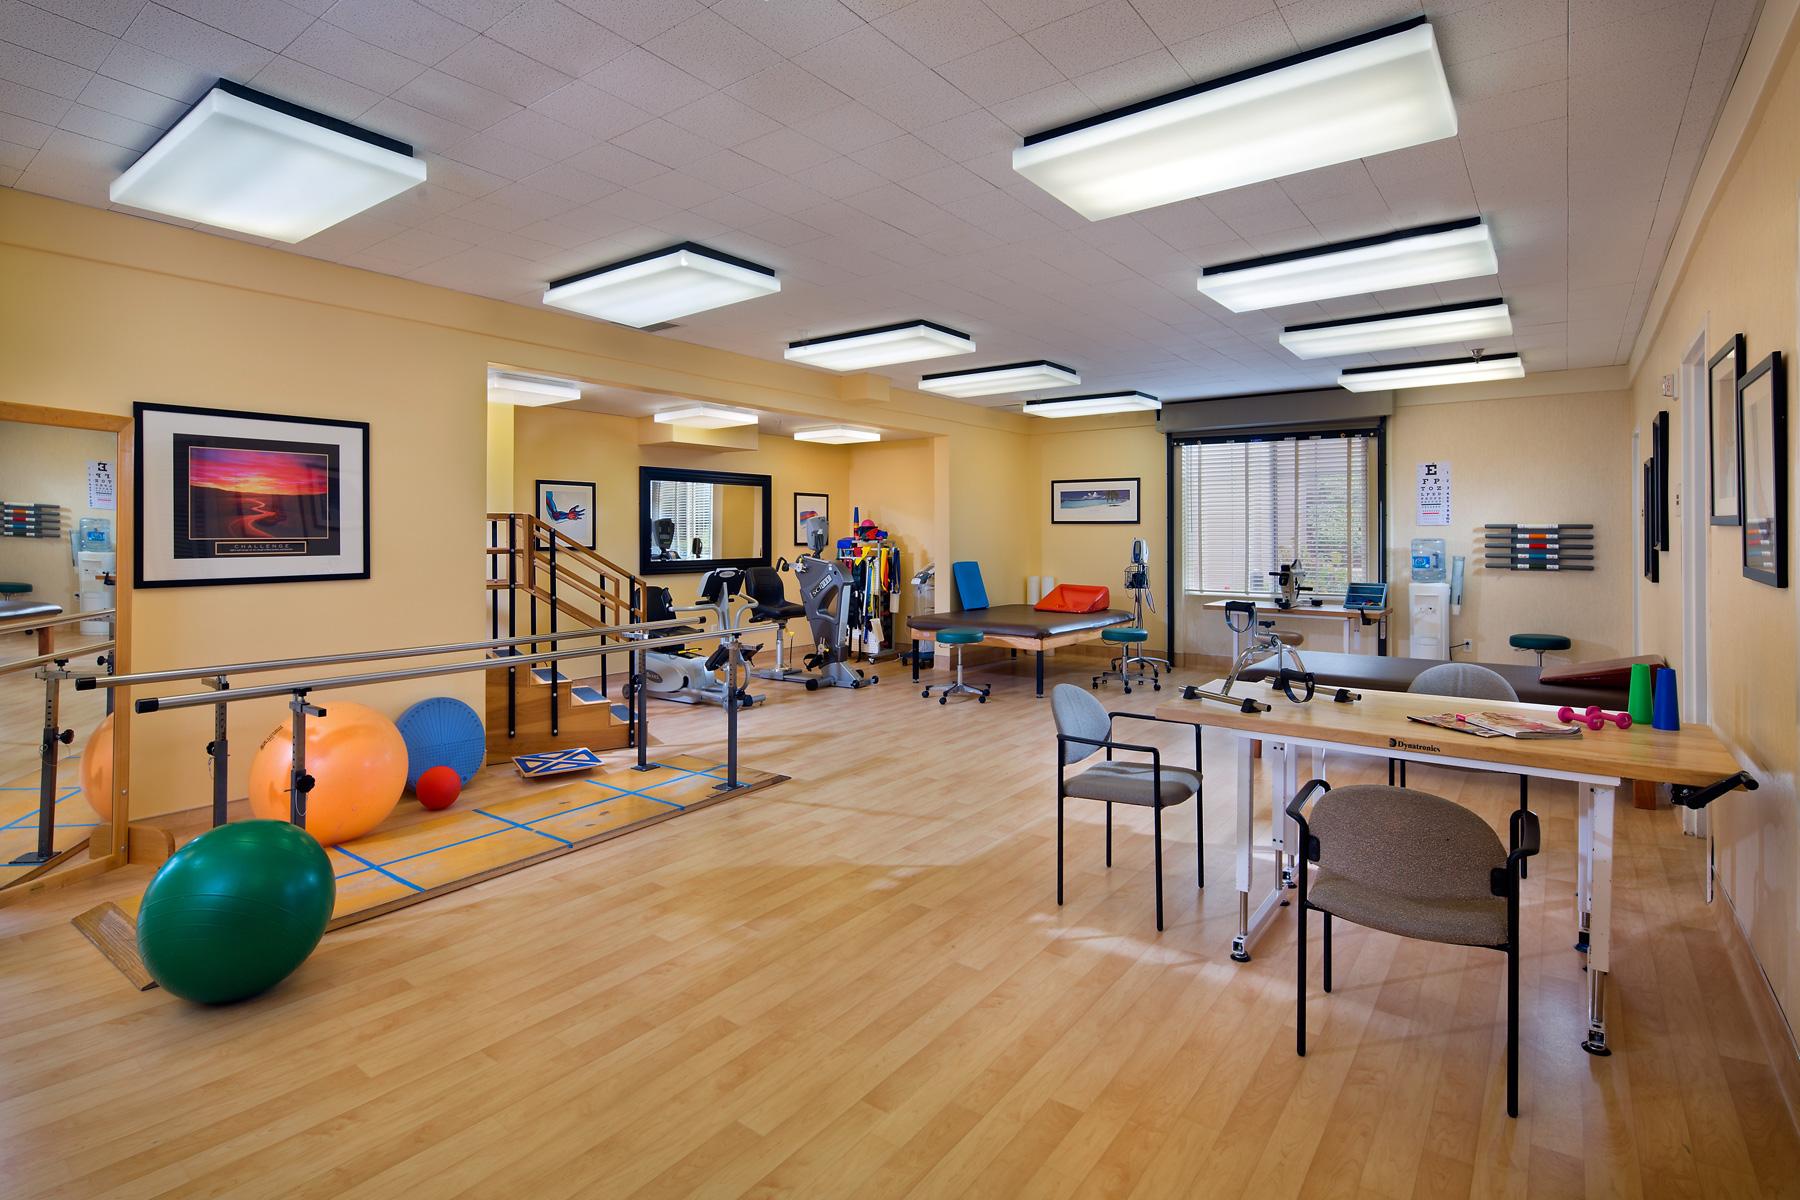 Rehabilitation gym.